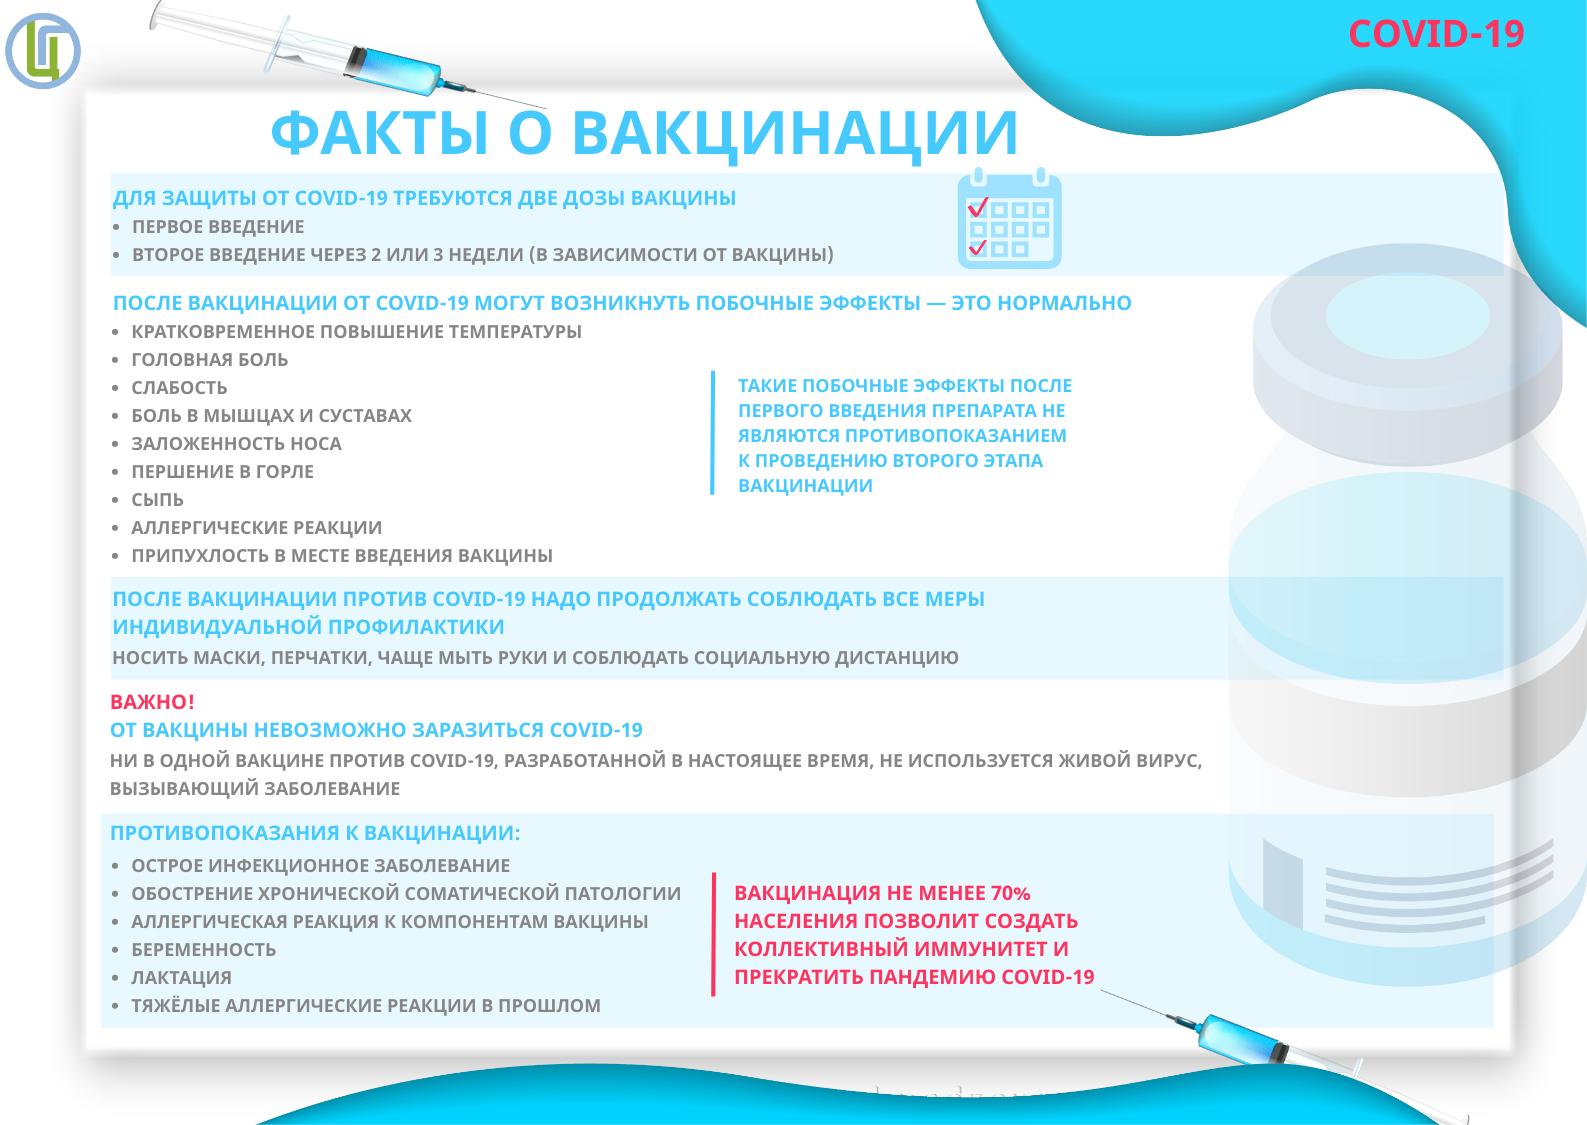 https://admin.cgon.ru/storage/MIKKk8yUC332lzTp1eEKTvdHyONvSL2FEC0T5V4U.png